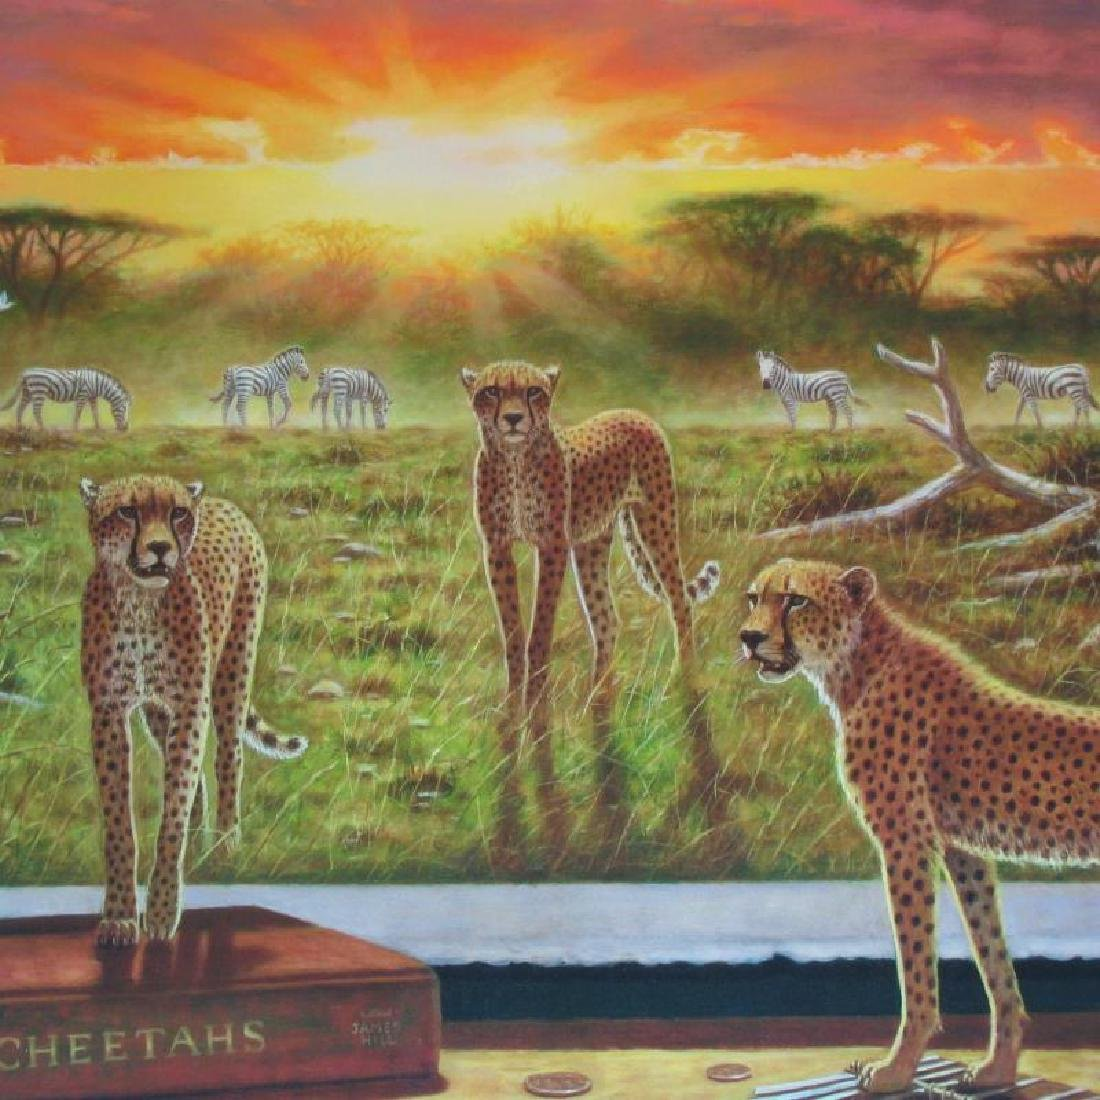 Cheetah Ltd Ed Large Canvas Newell Realistic Surreal - 2